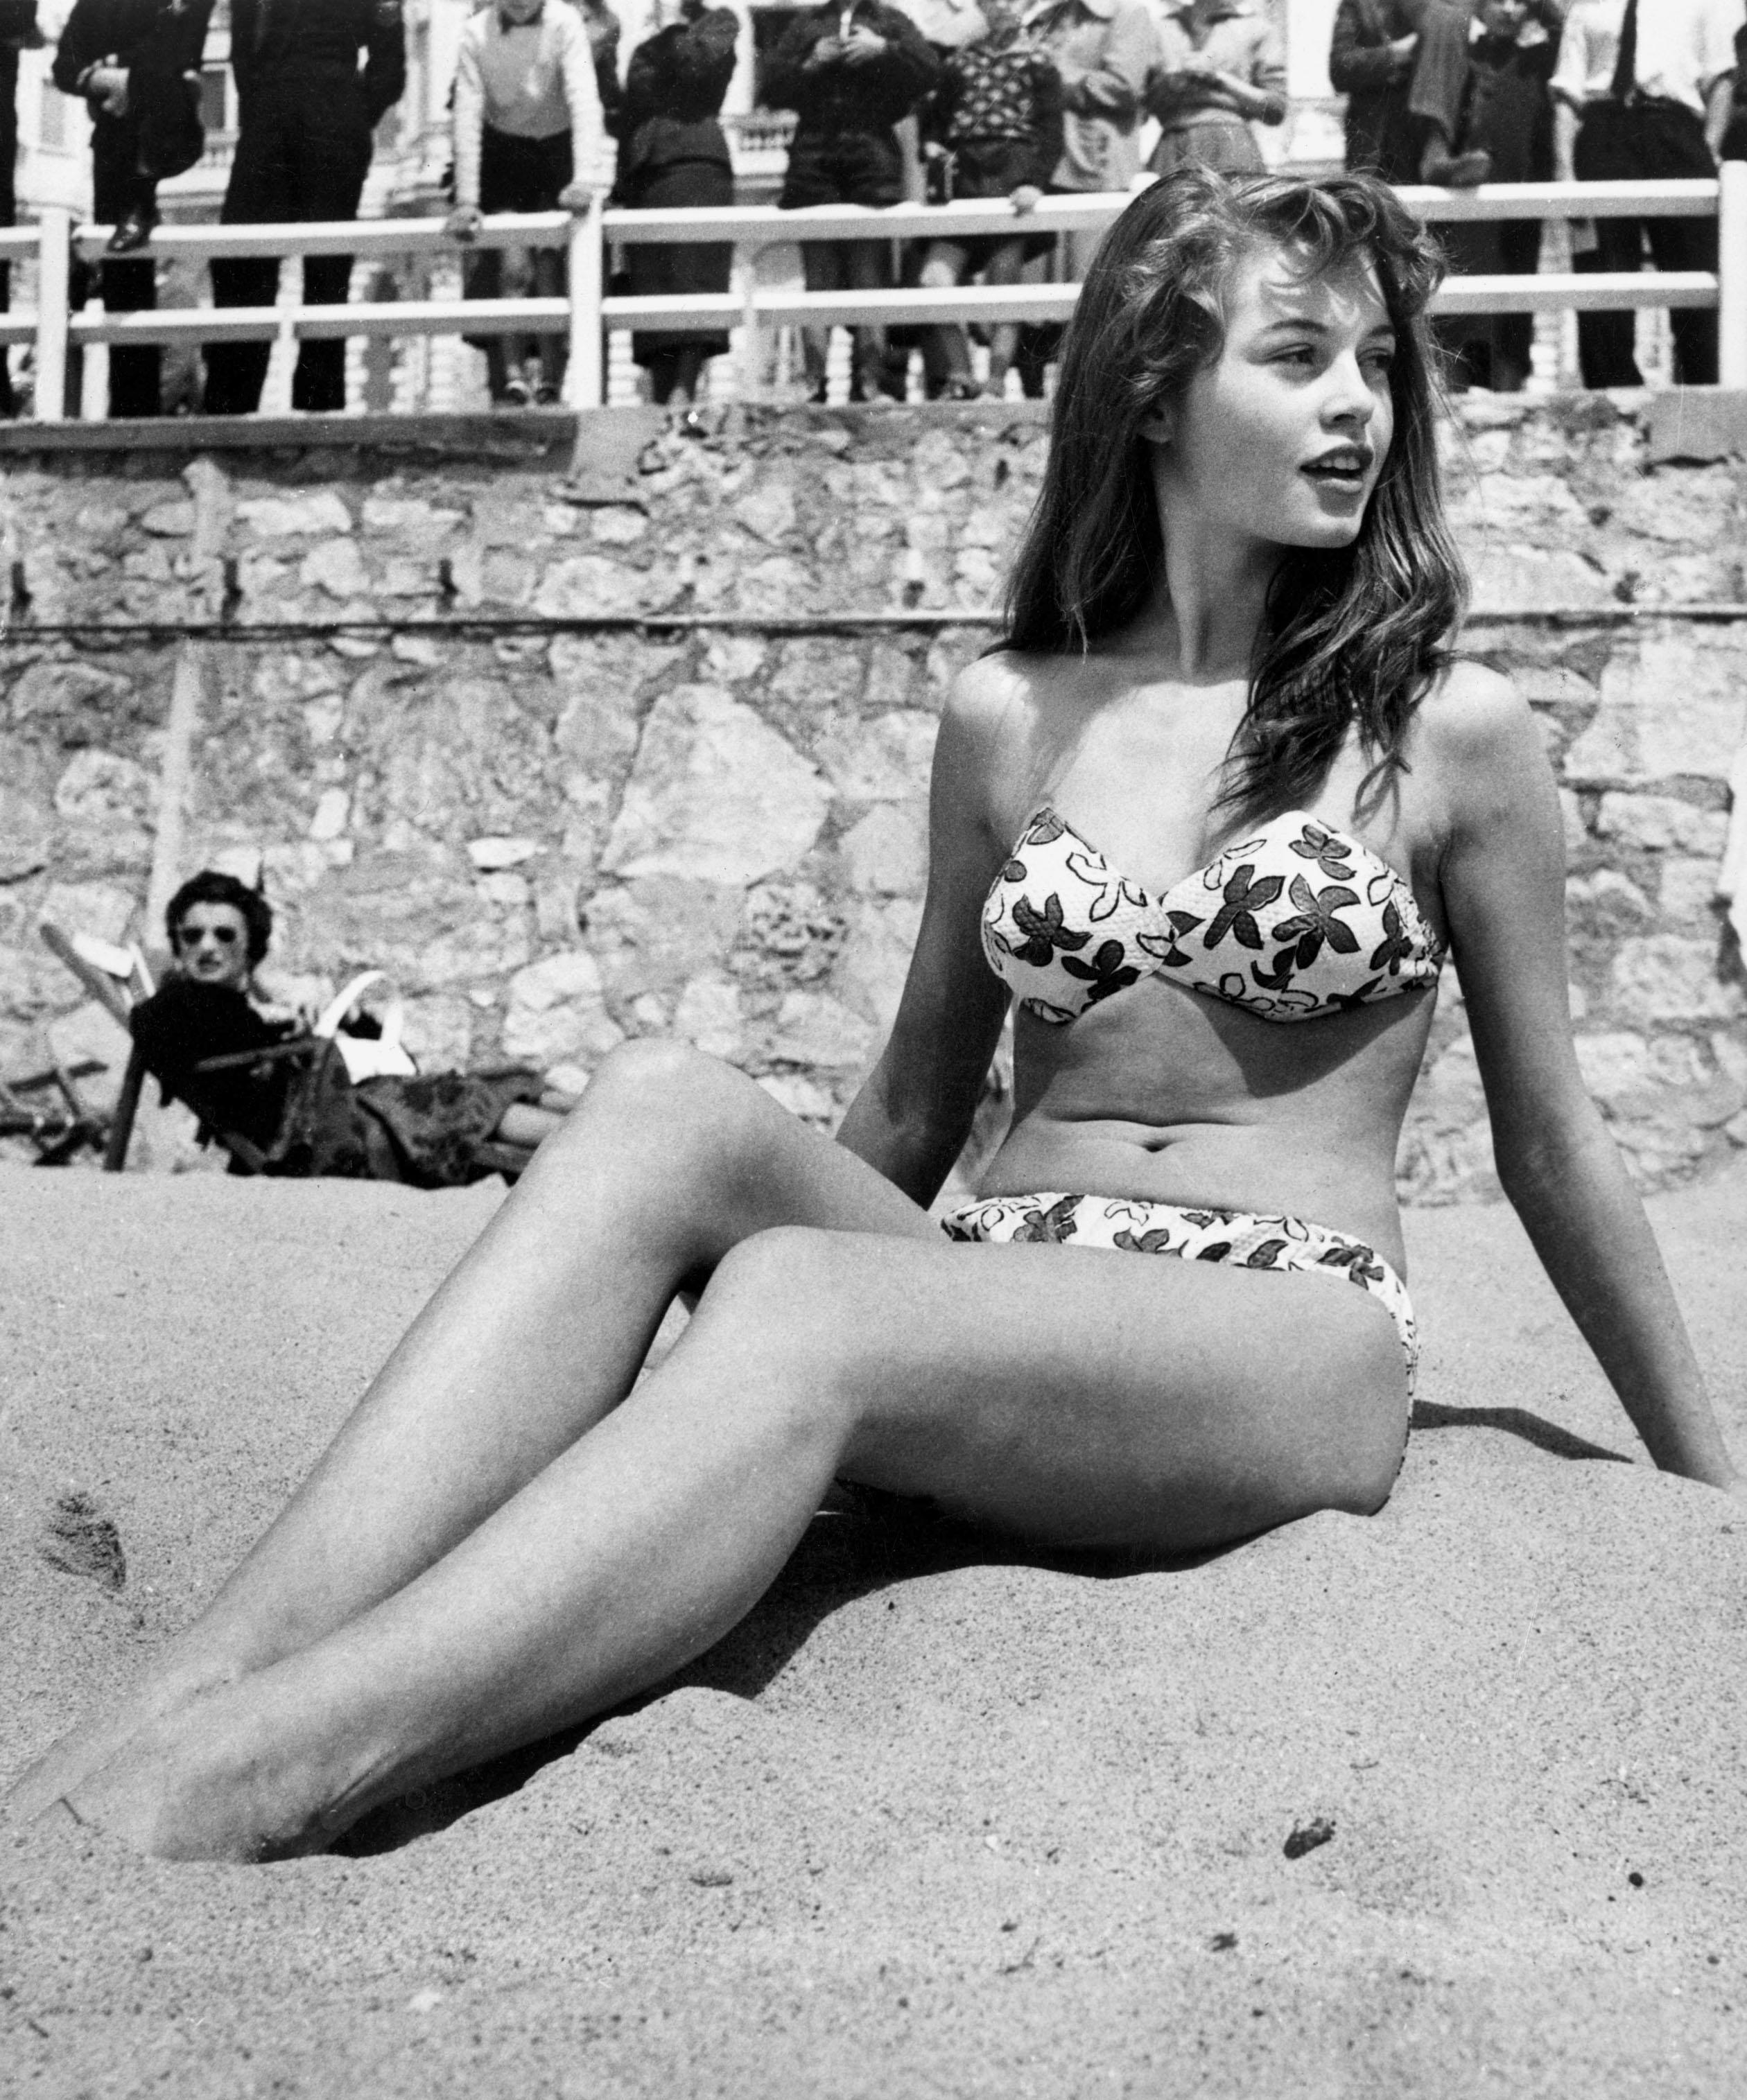 Fichier:Brigitte Bardot, 1953 (36209530070).jpg — Wikipédia